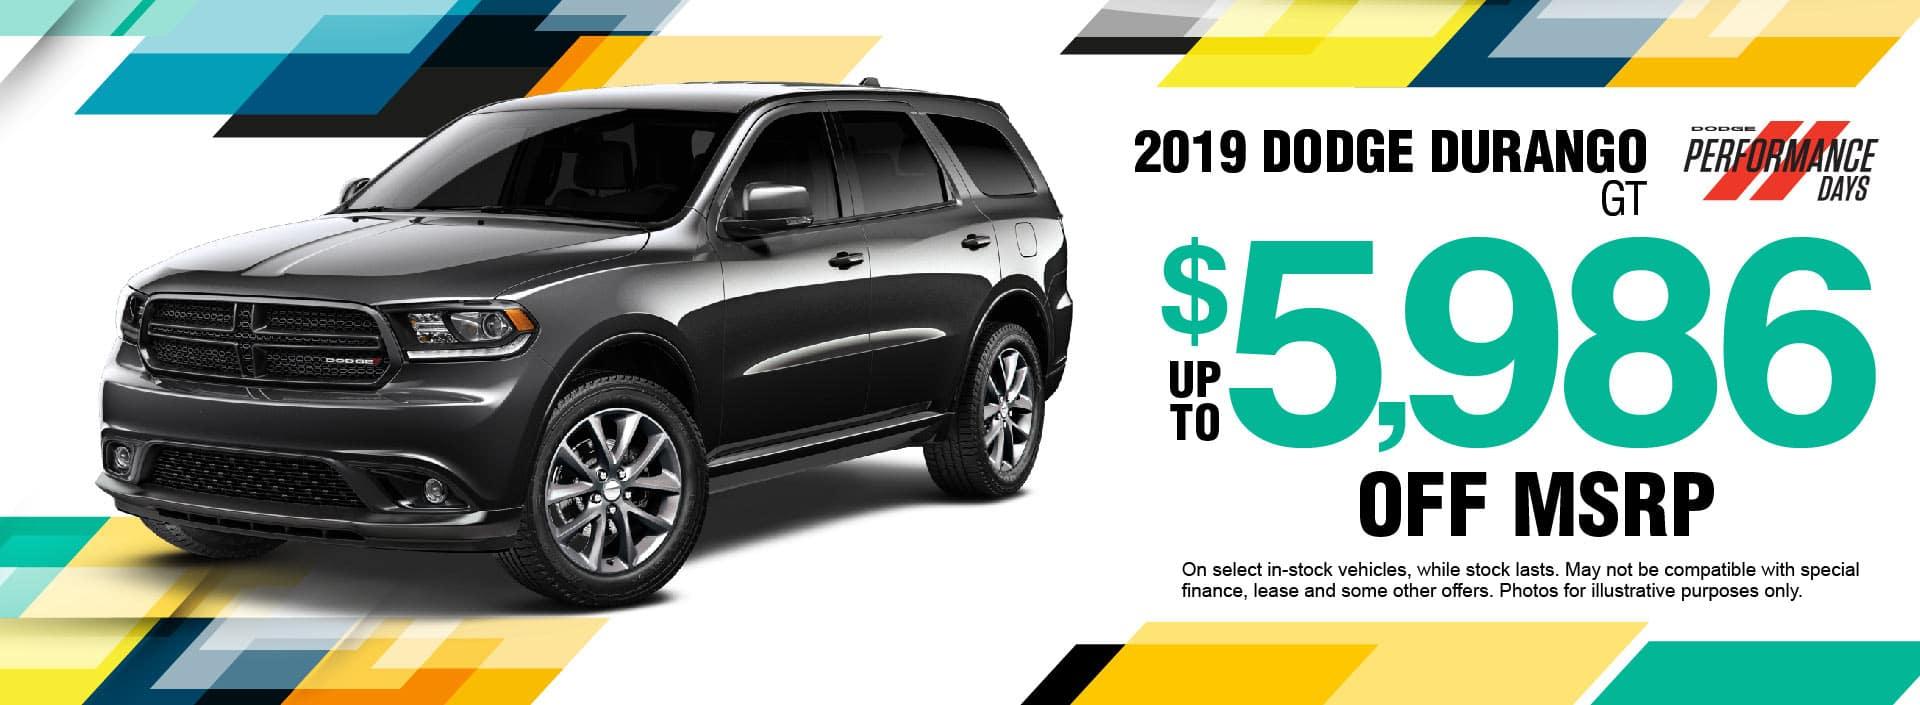 2019 Dodge Durango Savings